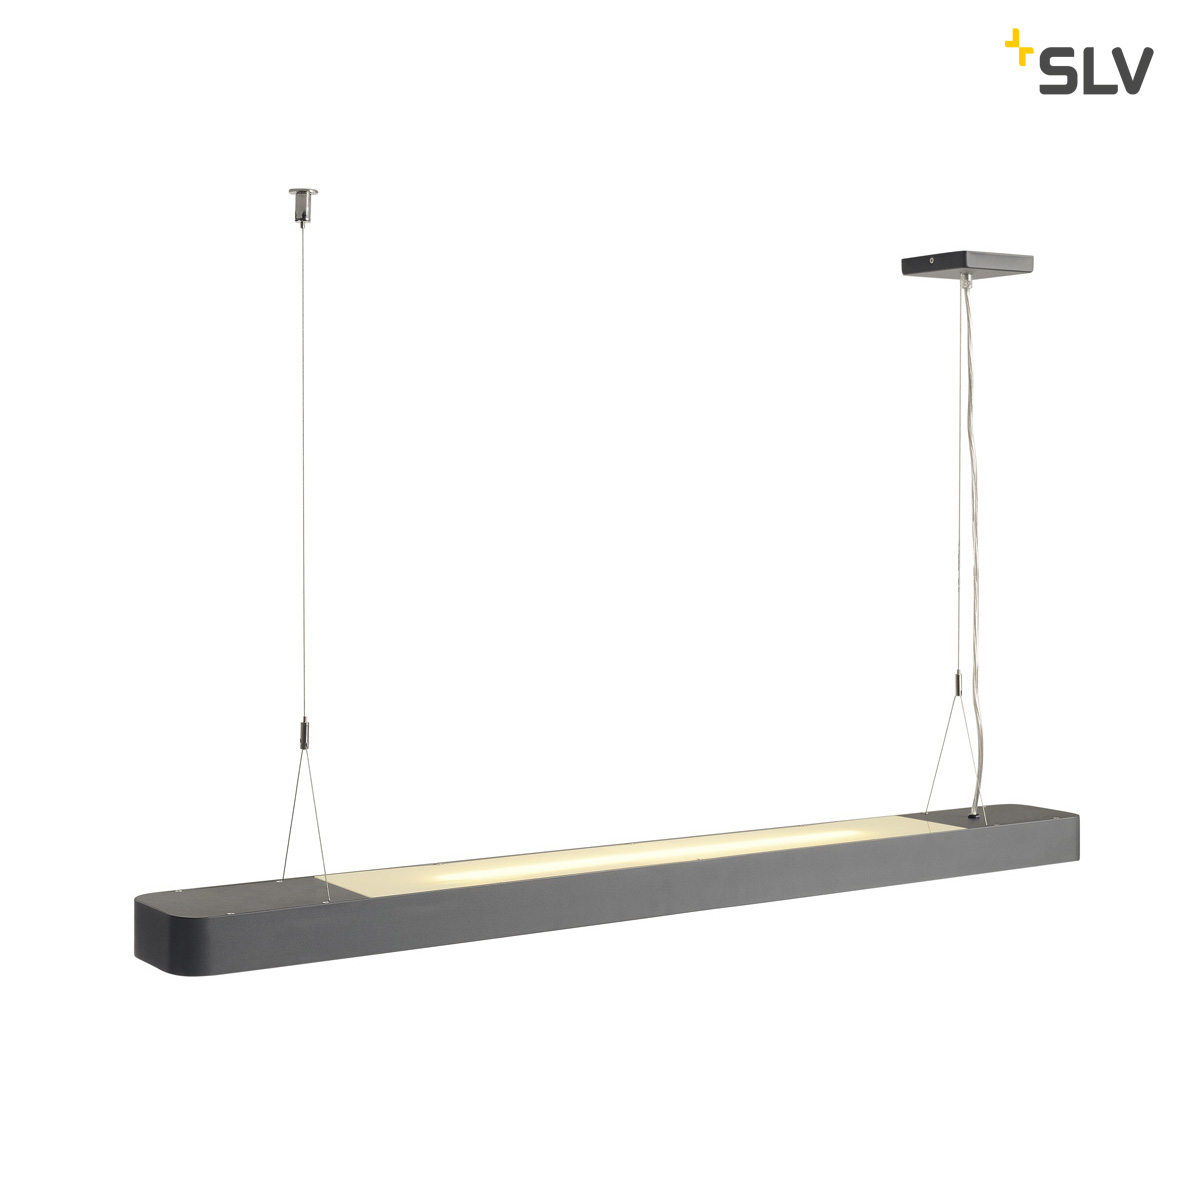 SLV WORKLIGHT LED pendel antraciet